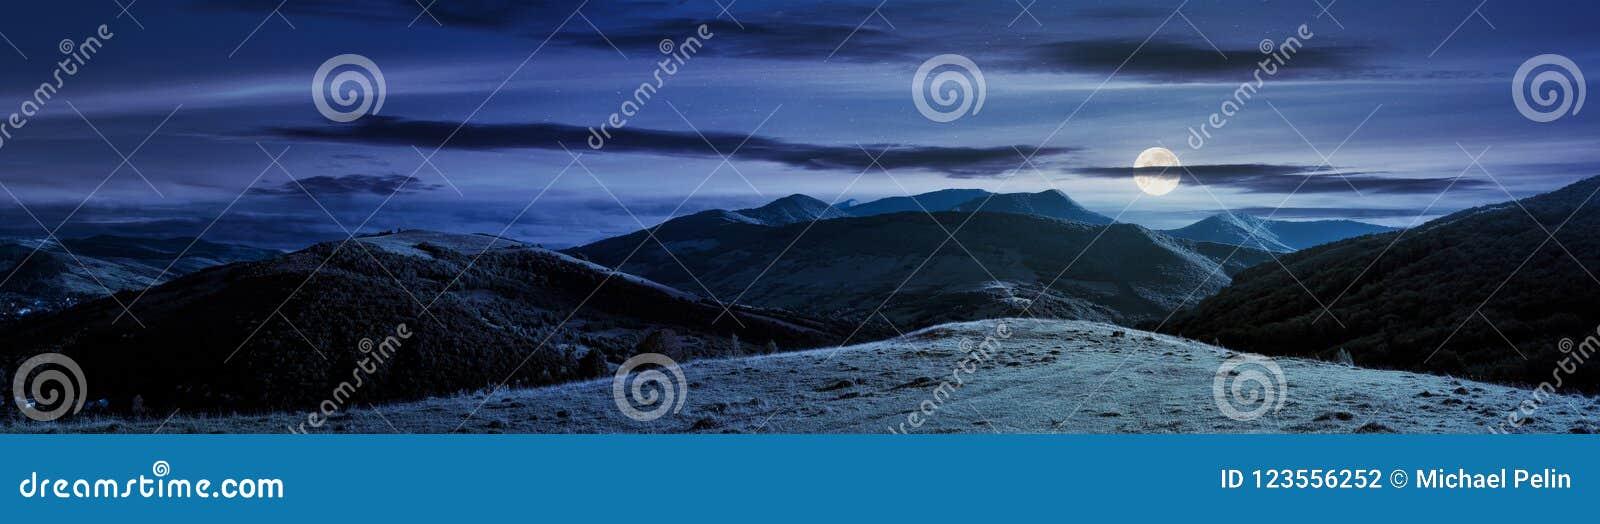 Panorama of mountainous countryside at night